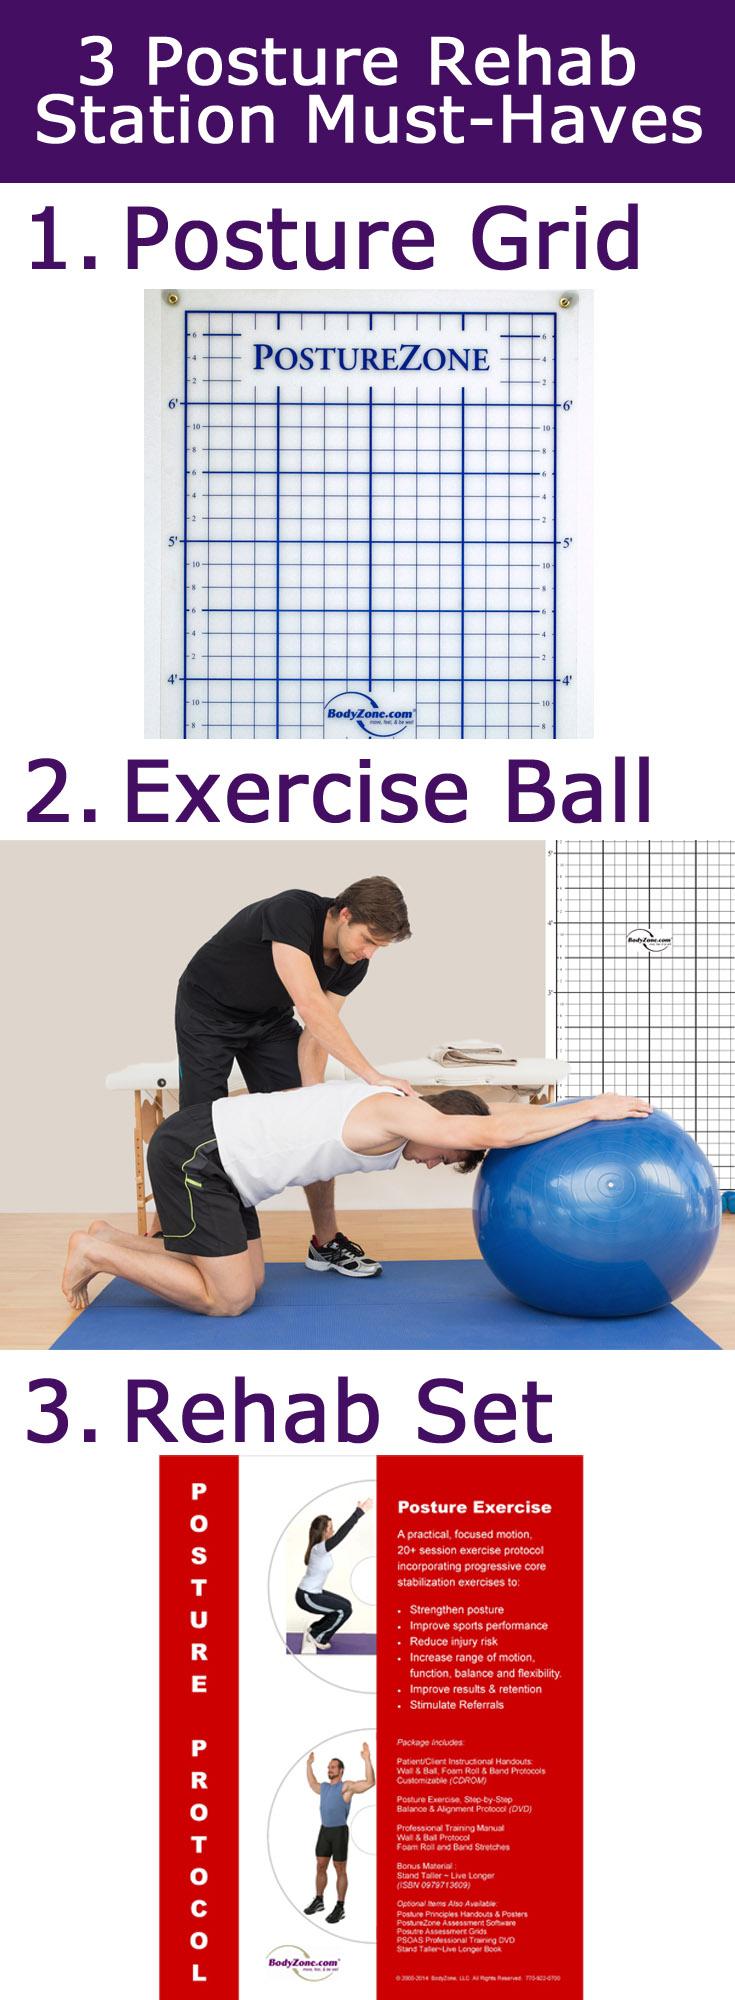 3-posture-rehab-station-must-haves